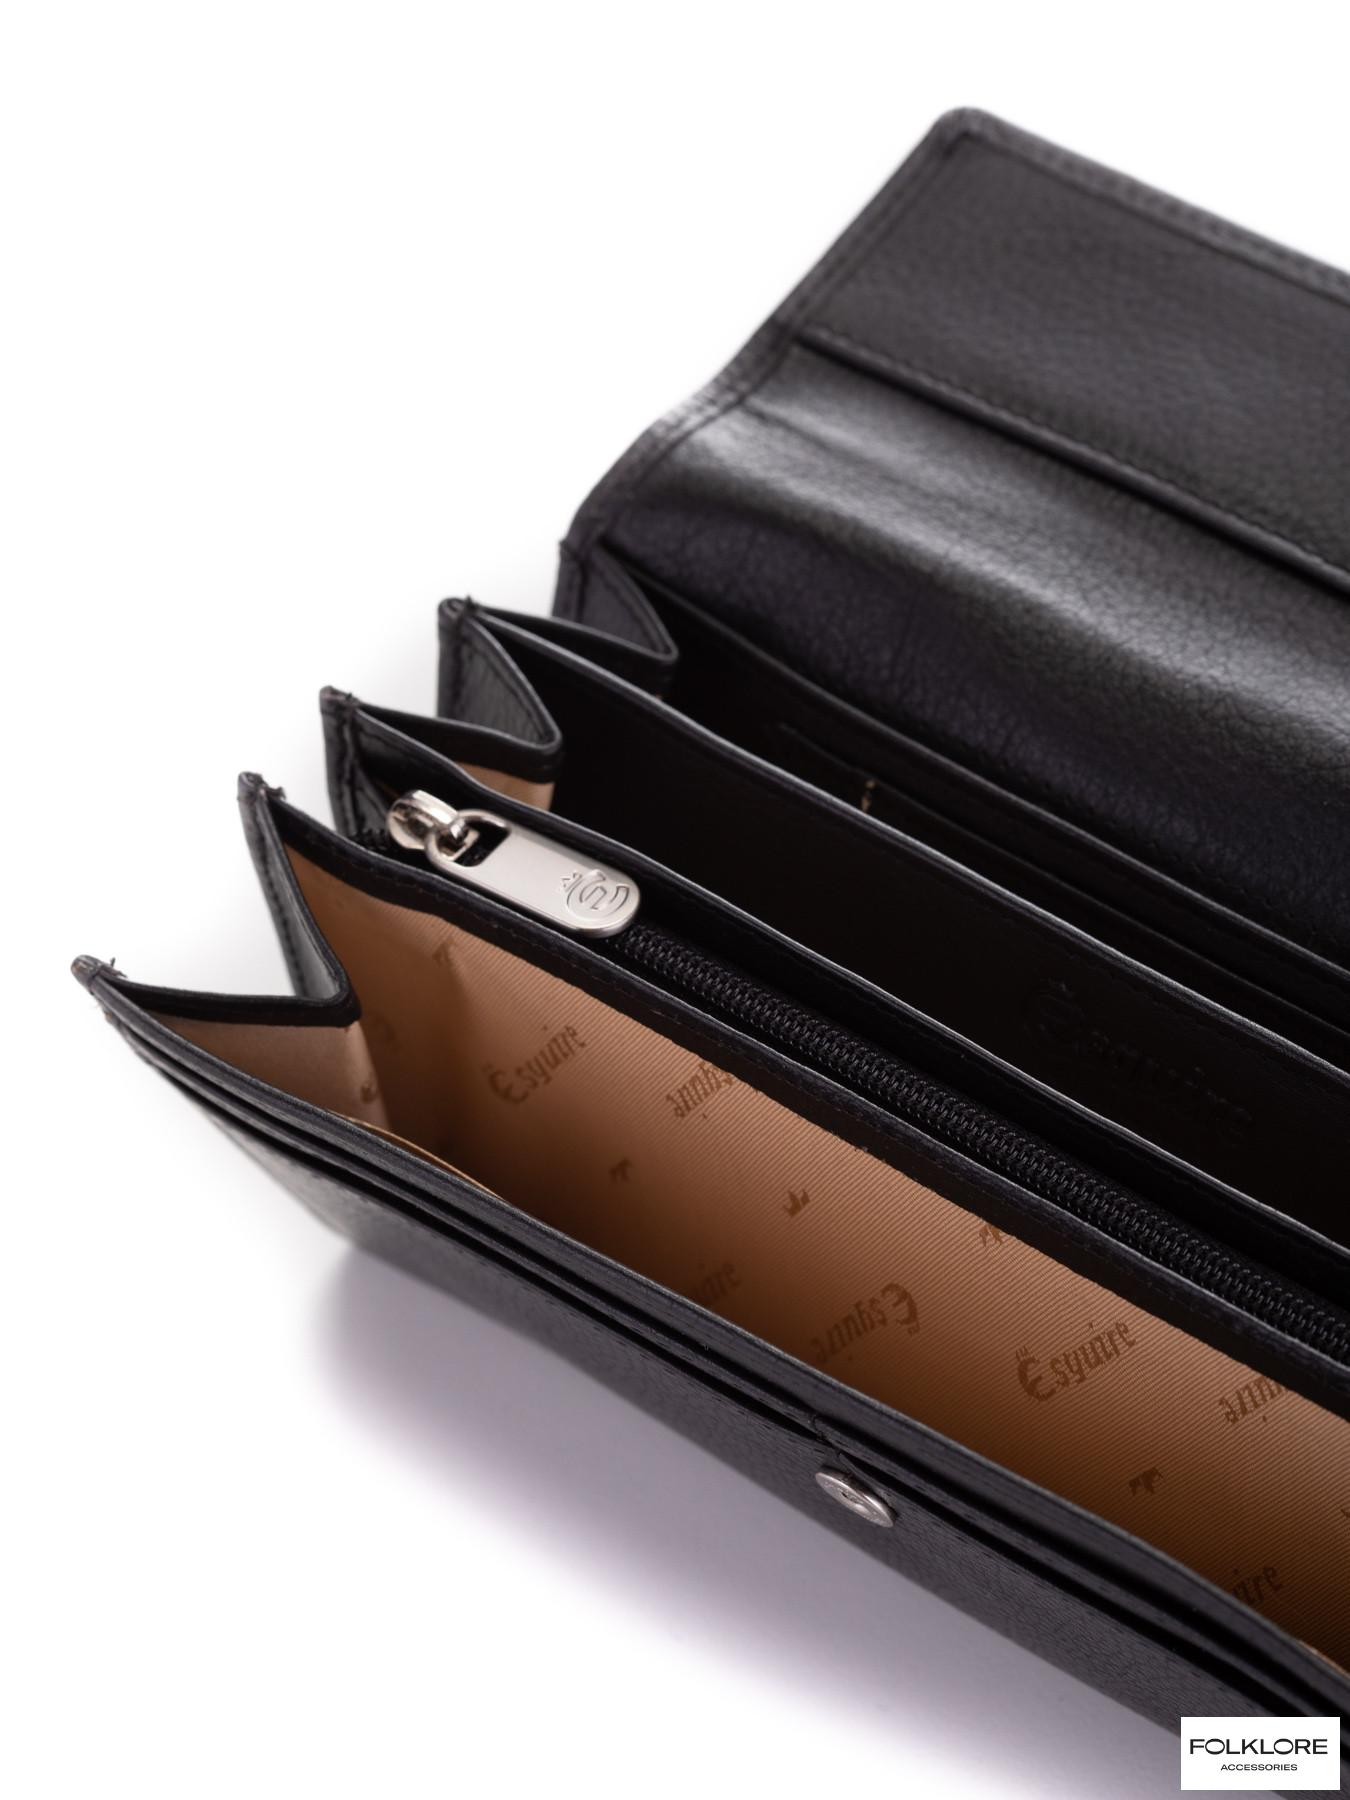 ESQUIRE Crni kožni novčanik